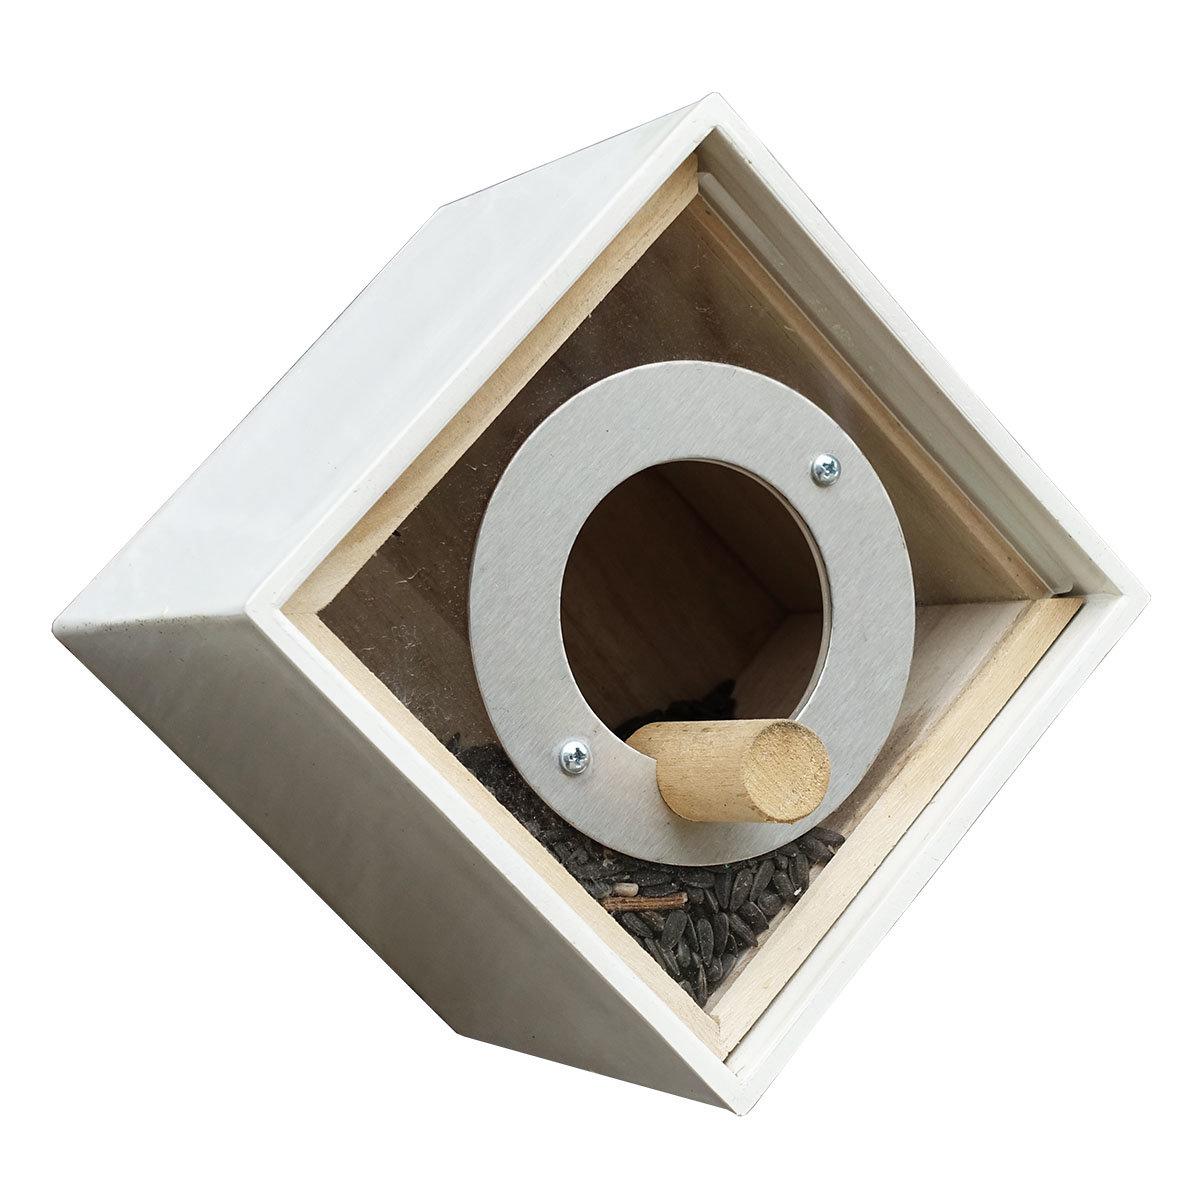 Vogelfutterhaus Urban Design | #4